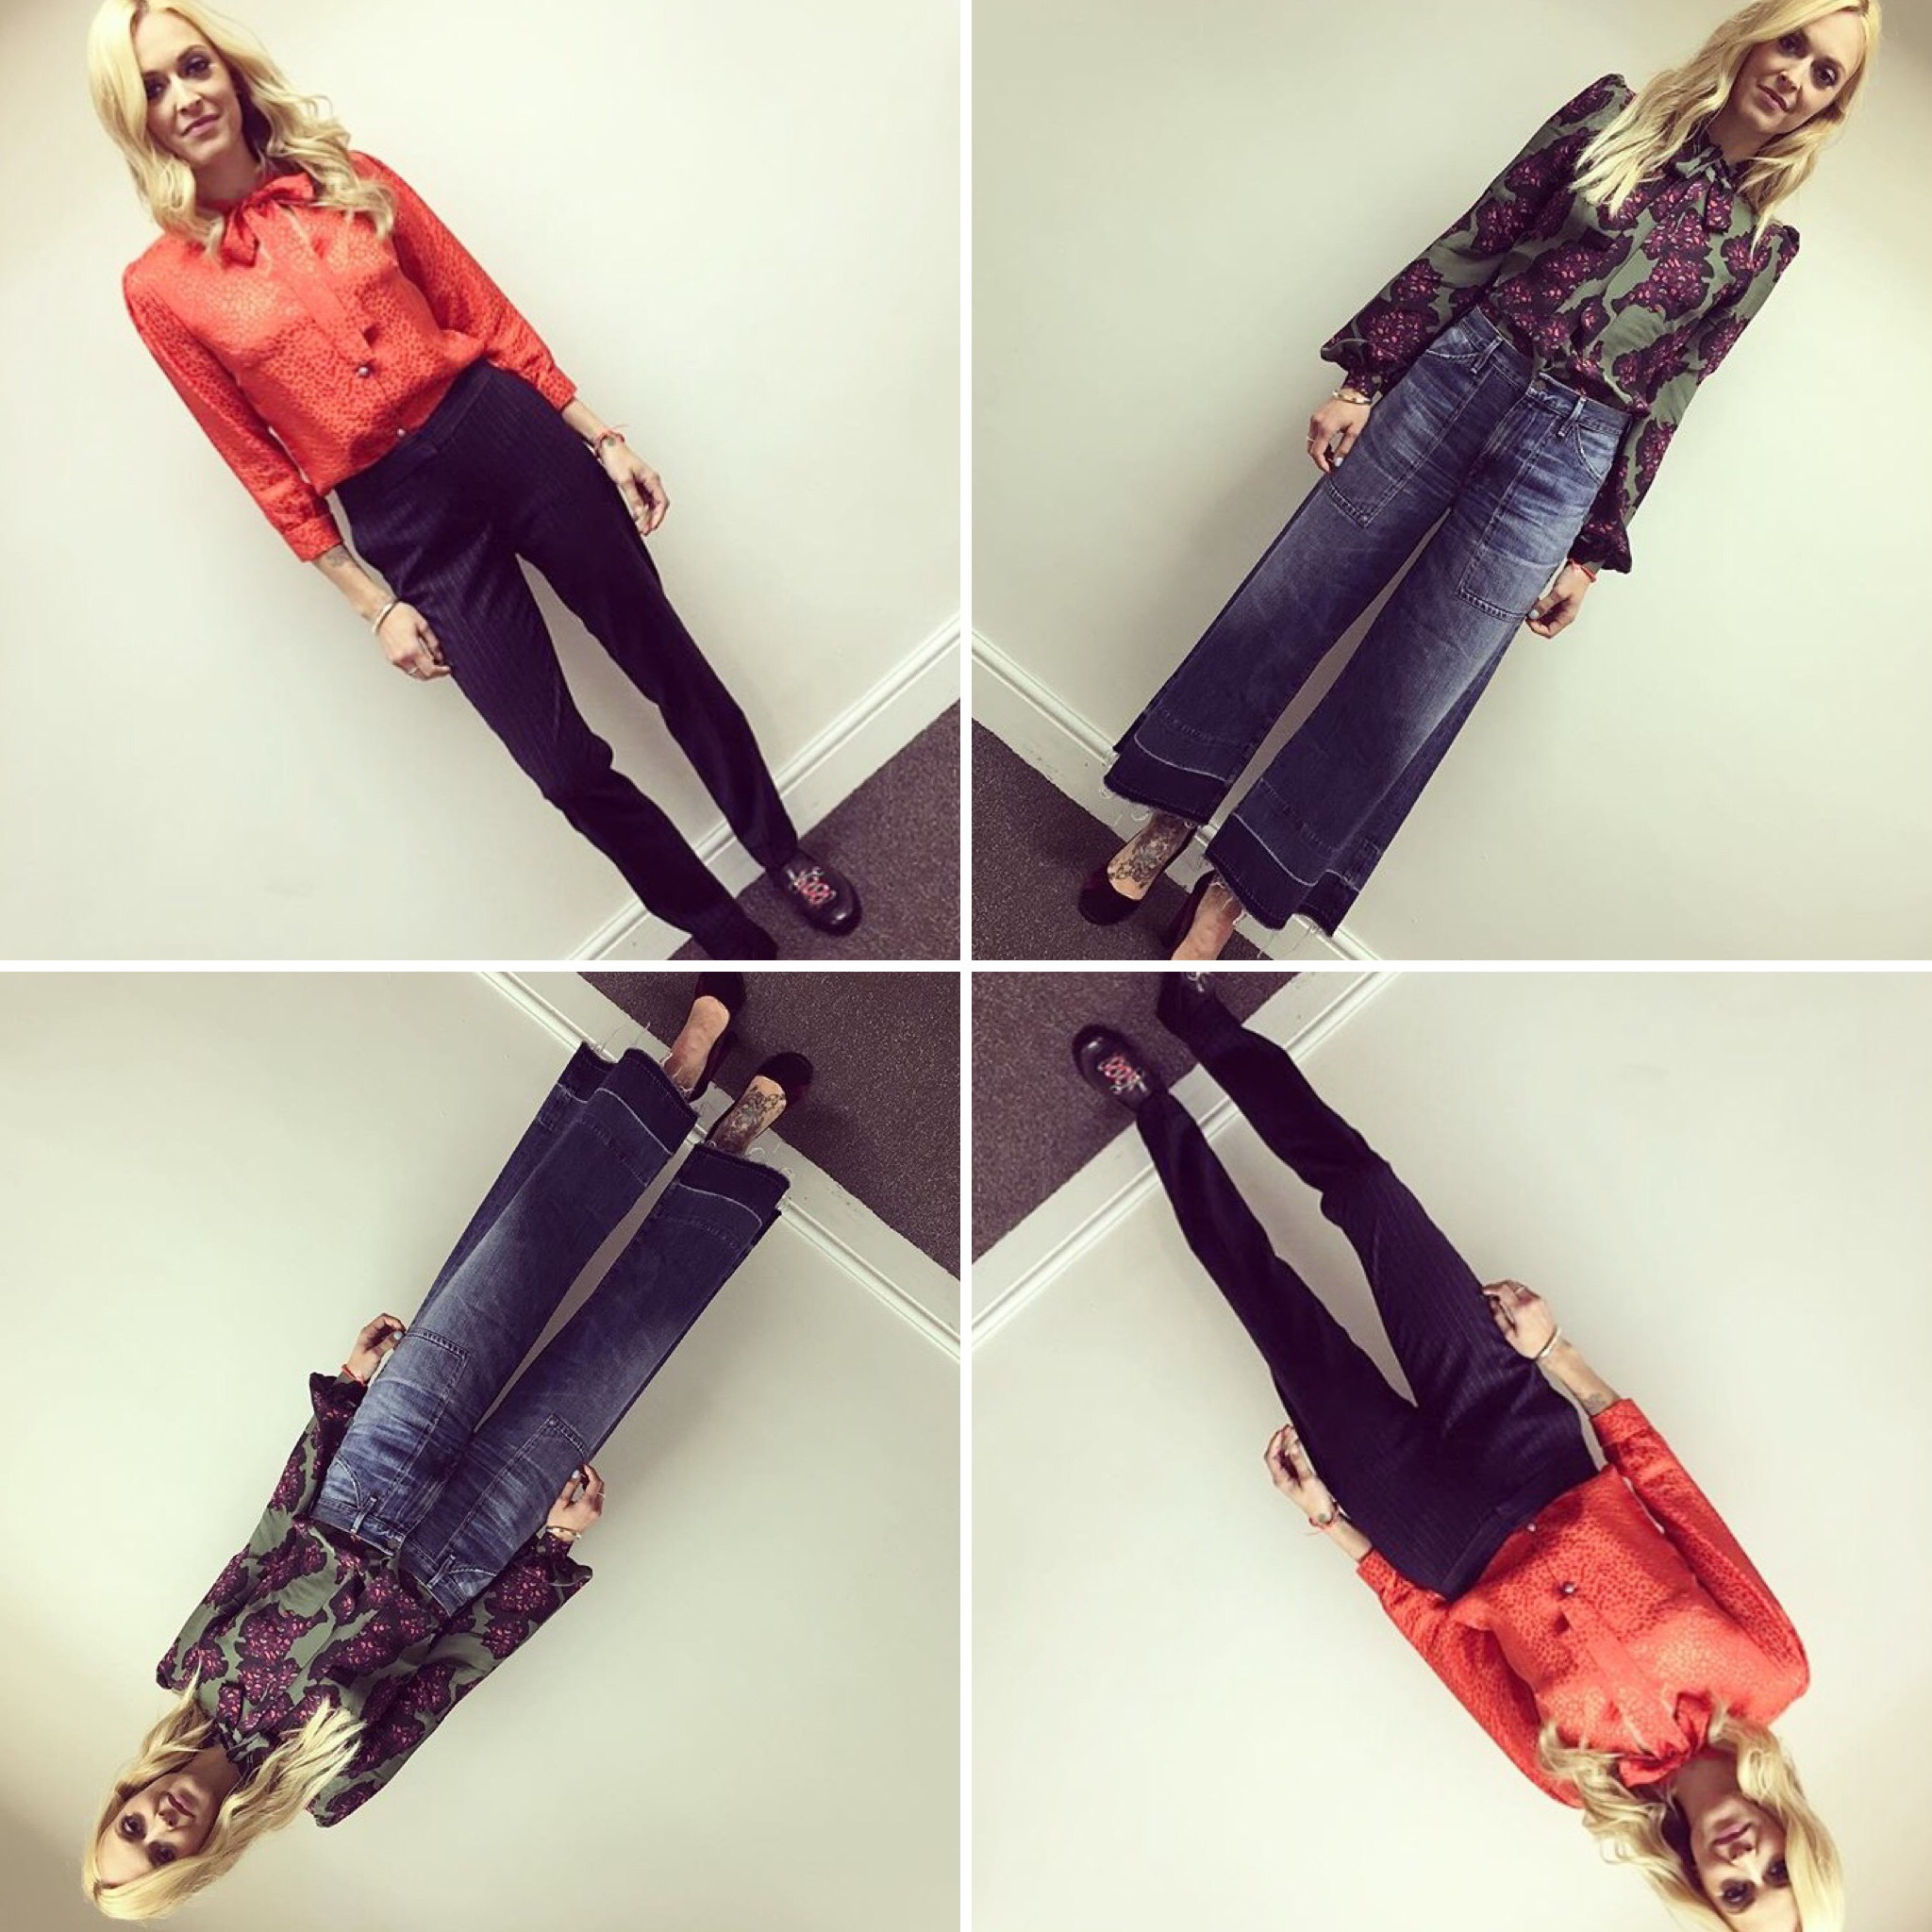 Ferne Cotton wearing luxury fashion designer Ellie Lines' Maddie and Tina silk blouses